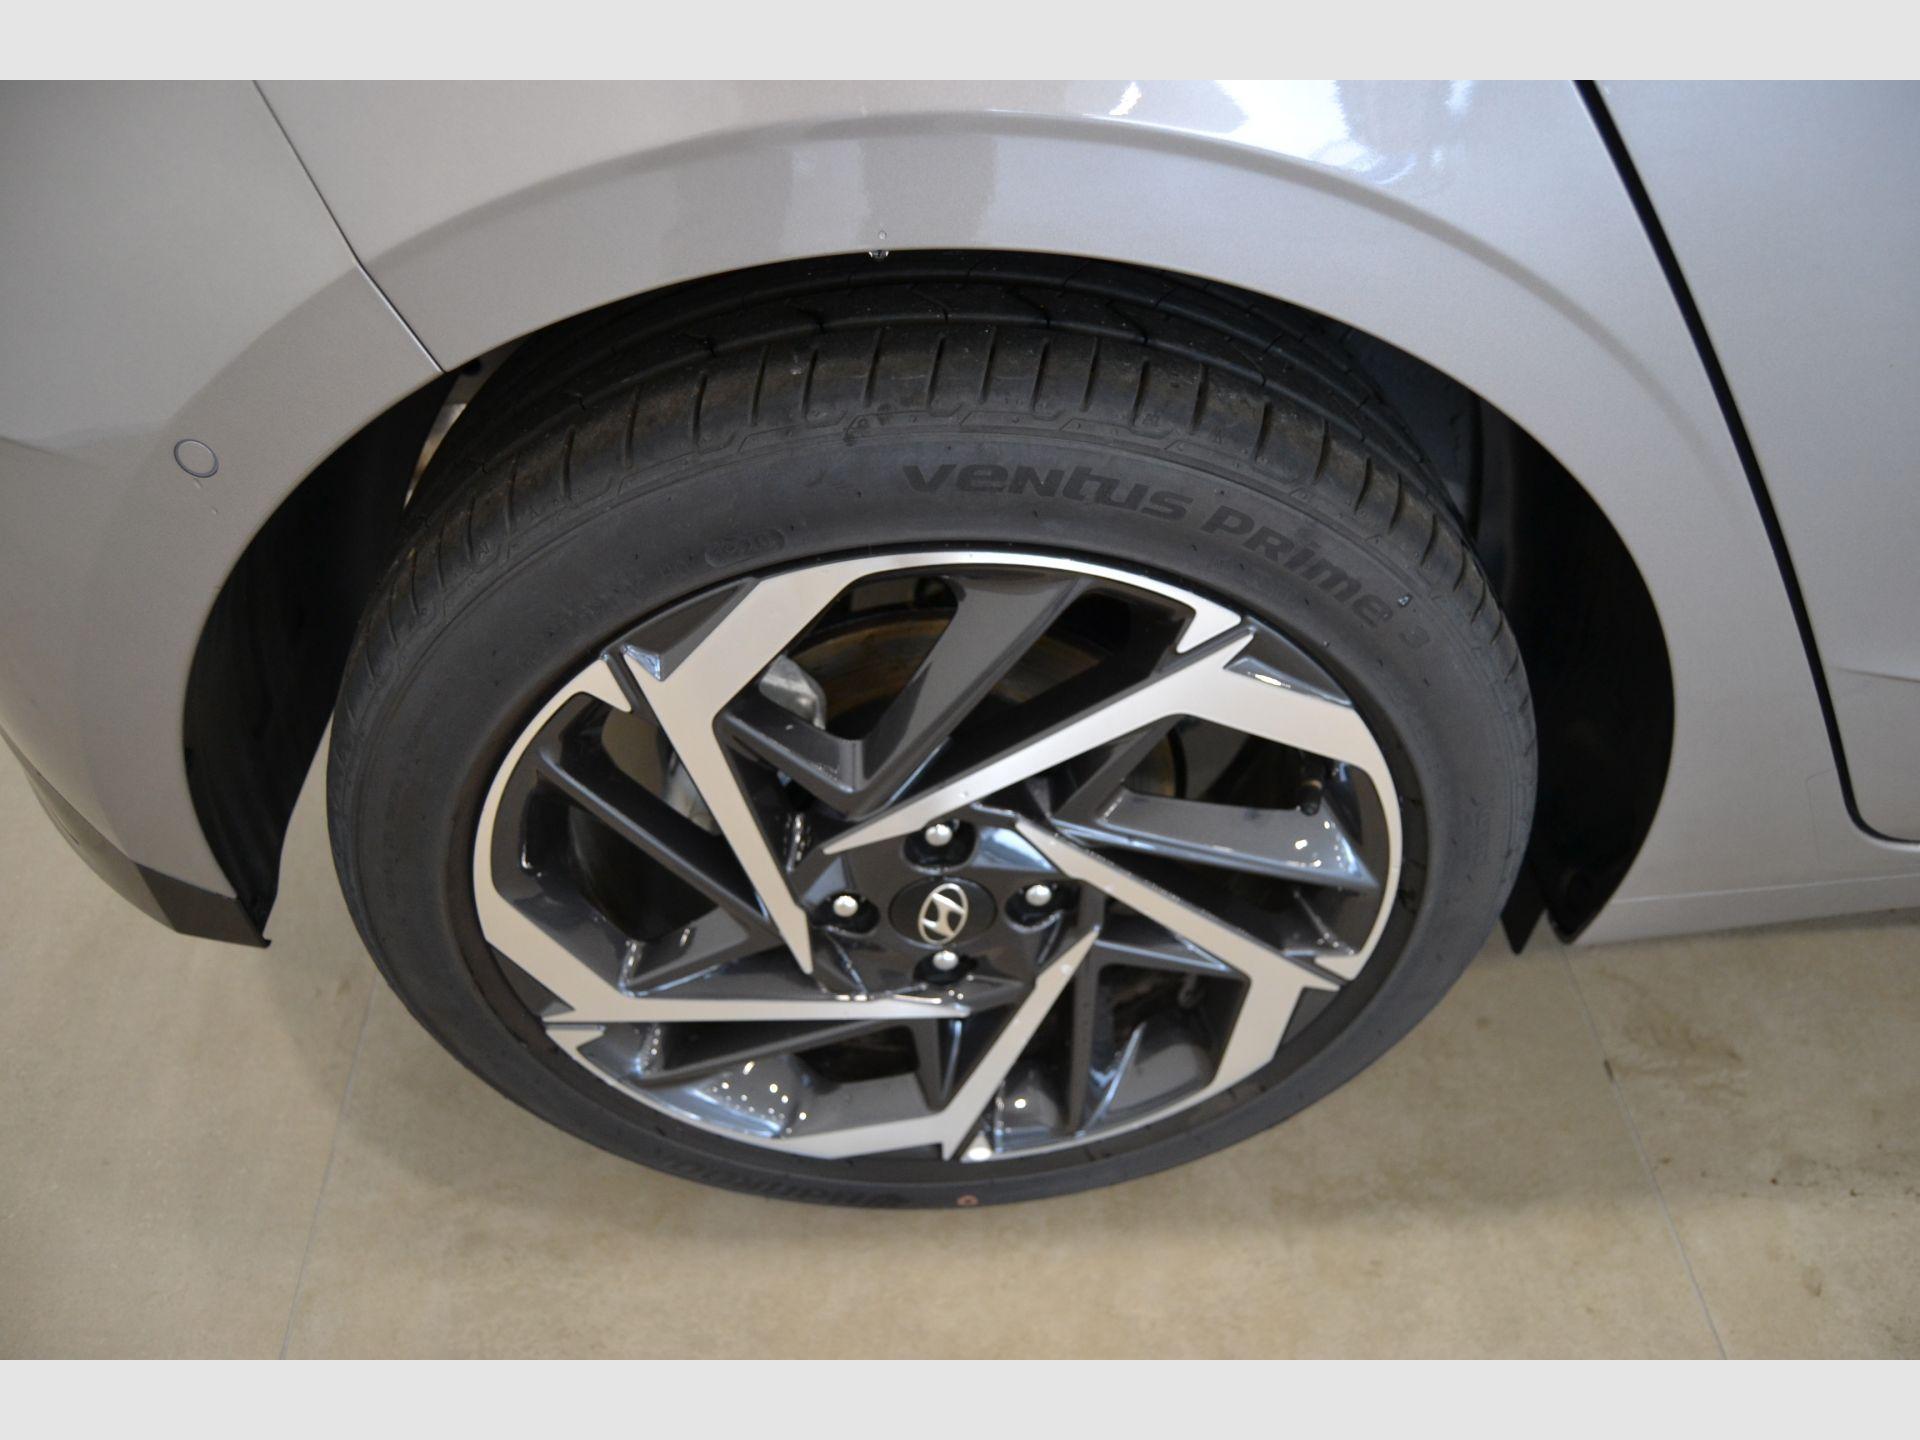 Hyundai Kona 1.6 GDI HEV Tecno 2C DCT